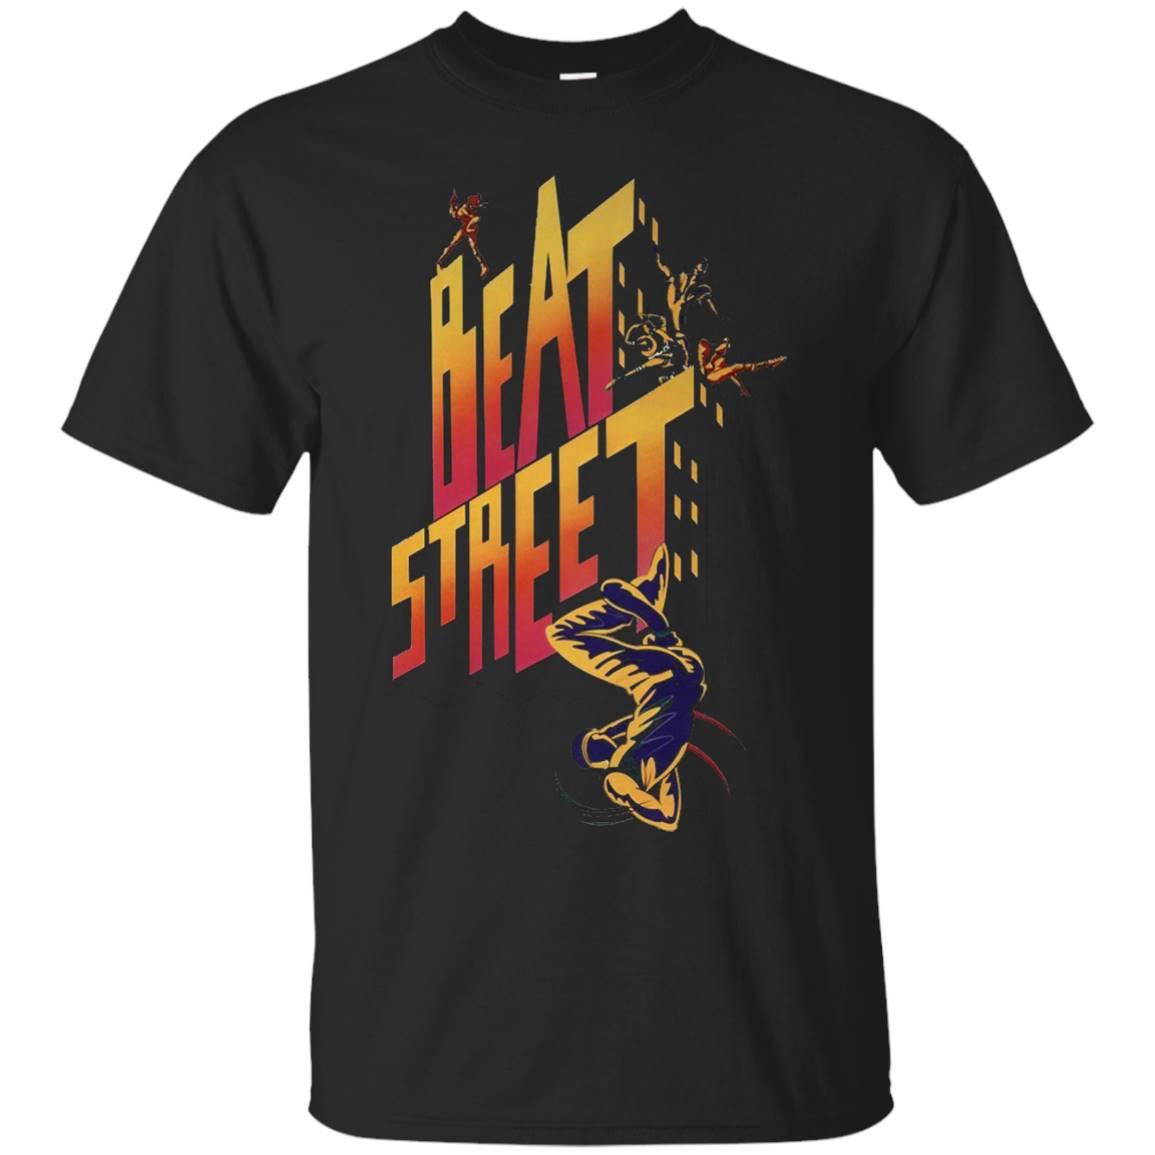 BEAT STREET Shirt – Limited Edition